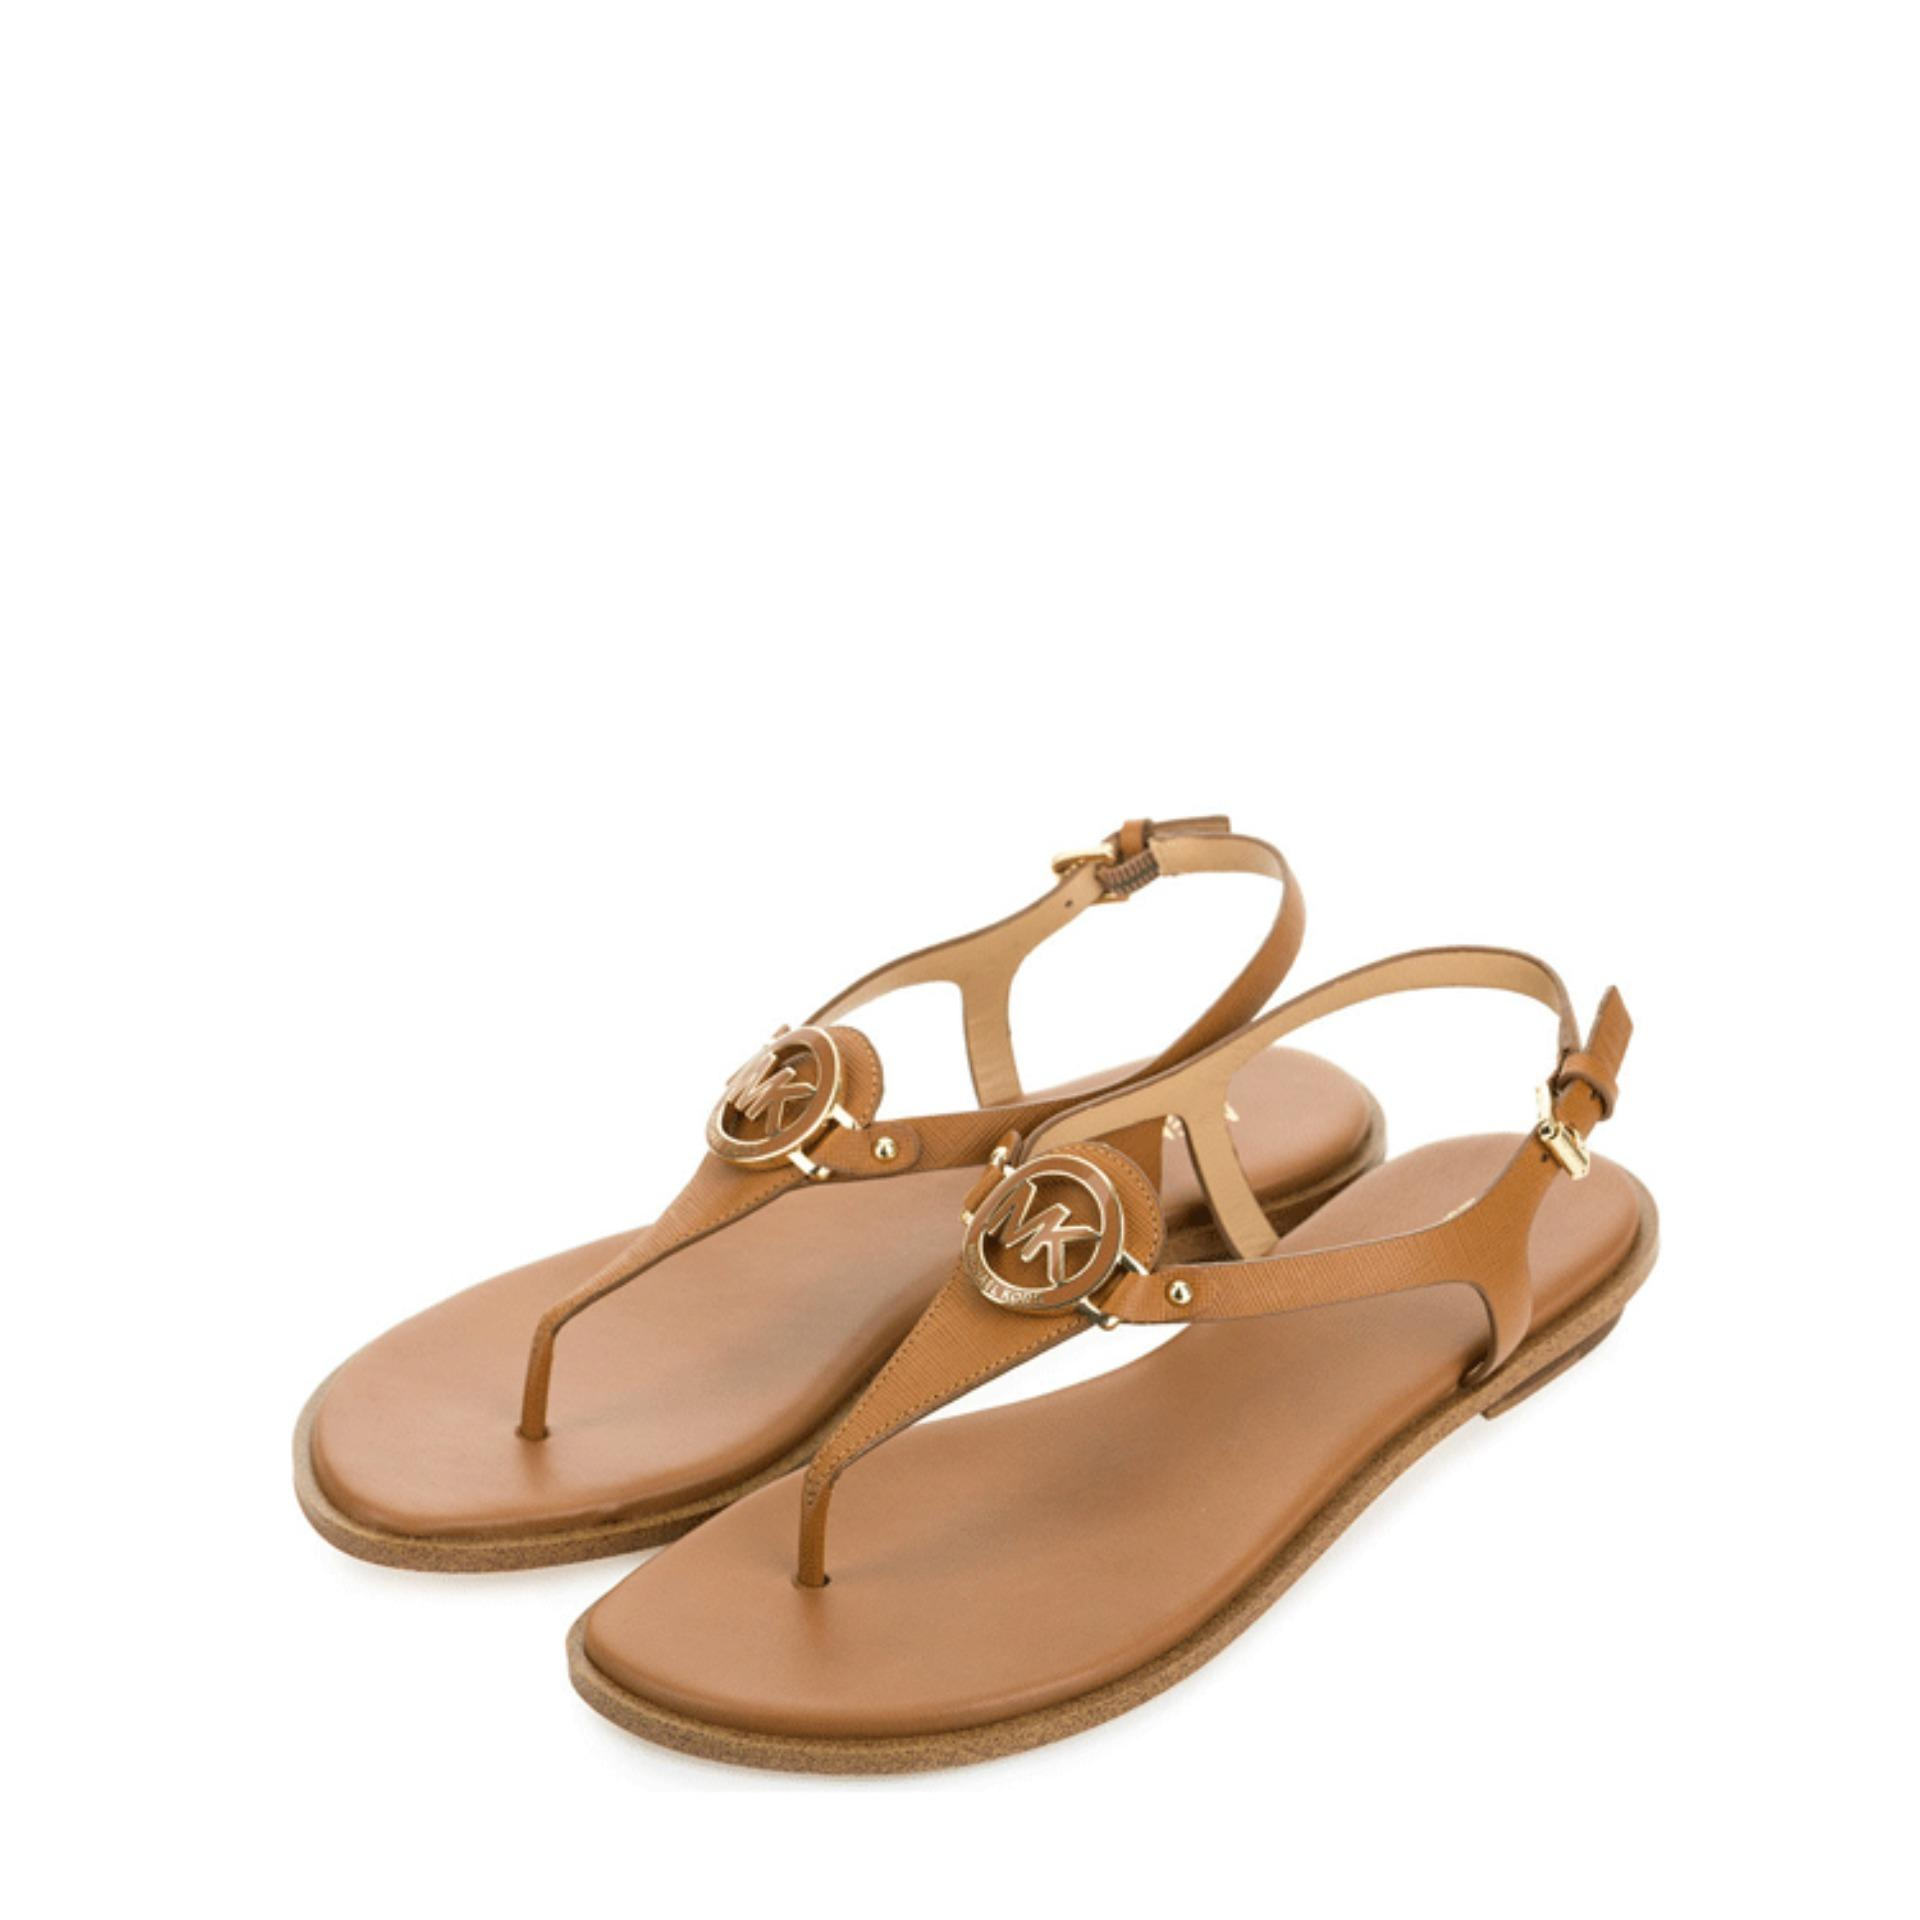 3c1520643bdd Michael Kors Lee Thong Sandals (Acorn)   40R6LEFS2LACORN